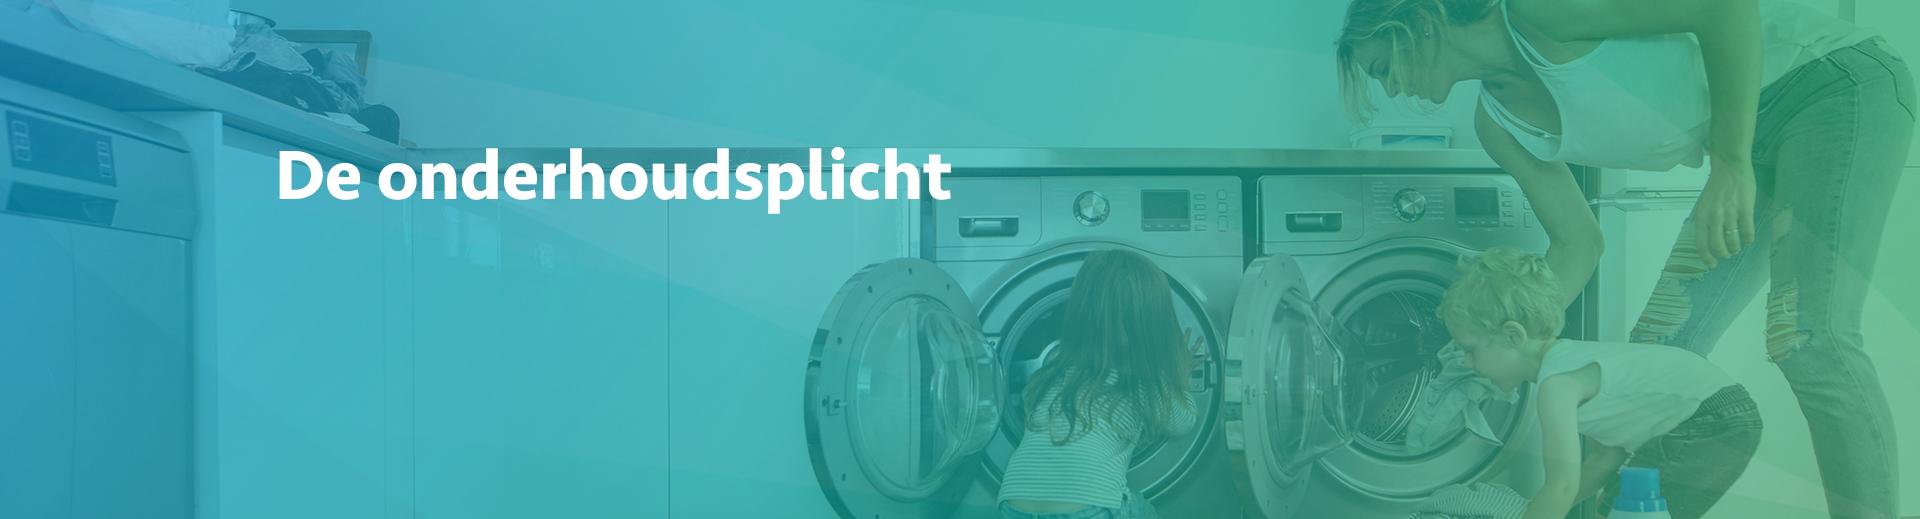 De onderhoudsplicht - Scheidingsplanner Almelo - Deventer - Nijverdal